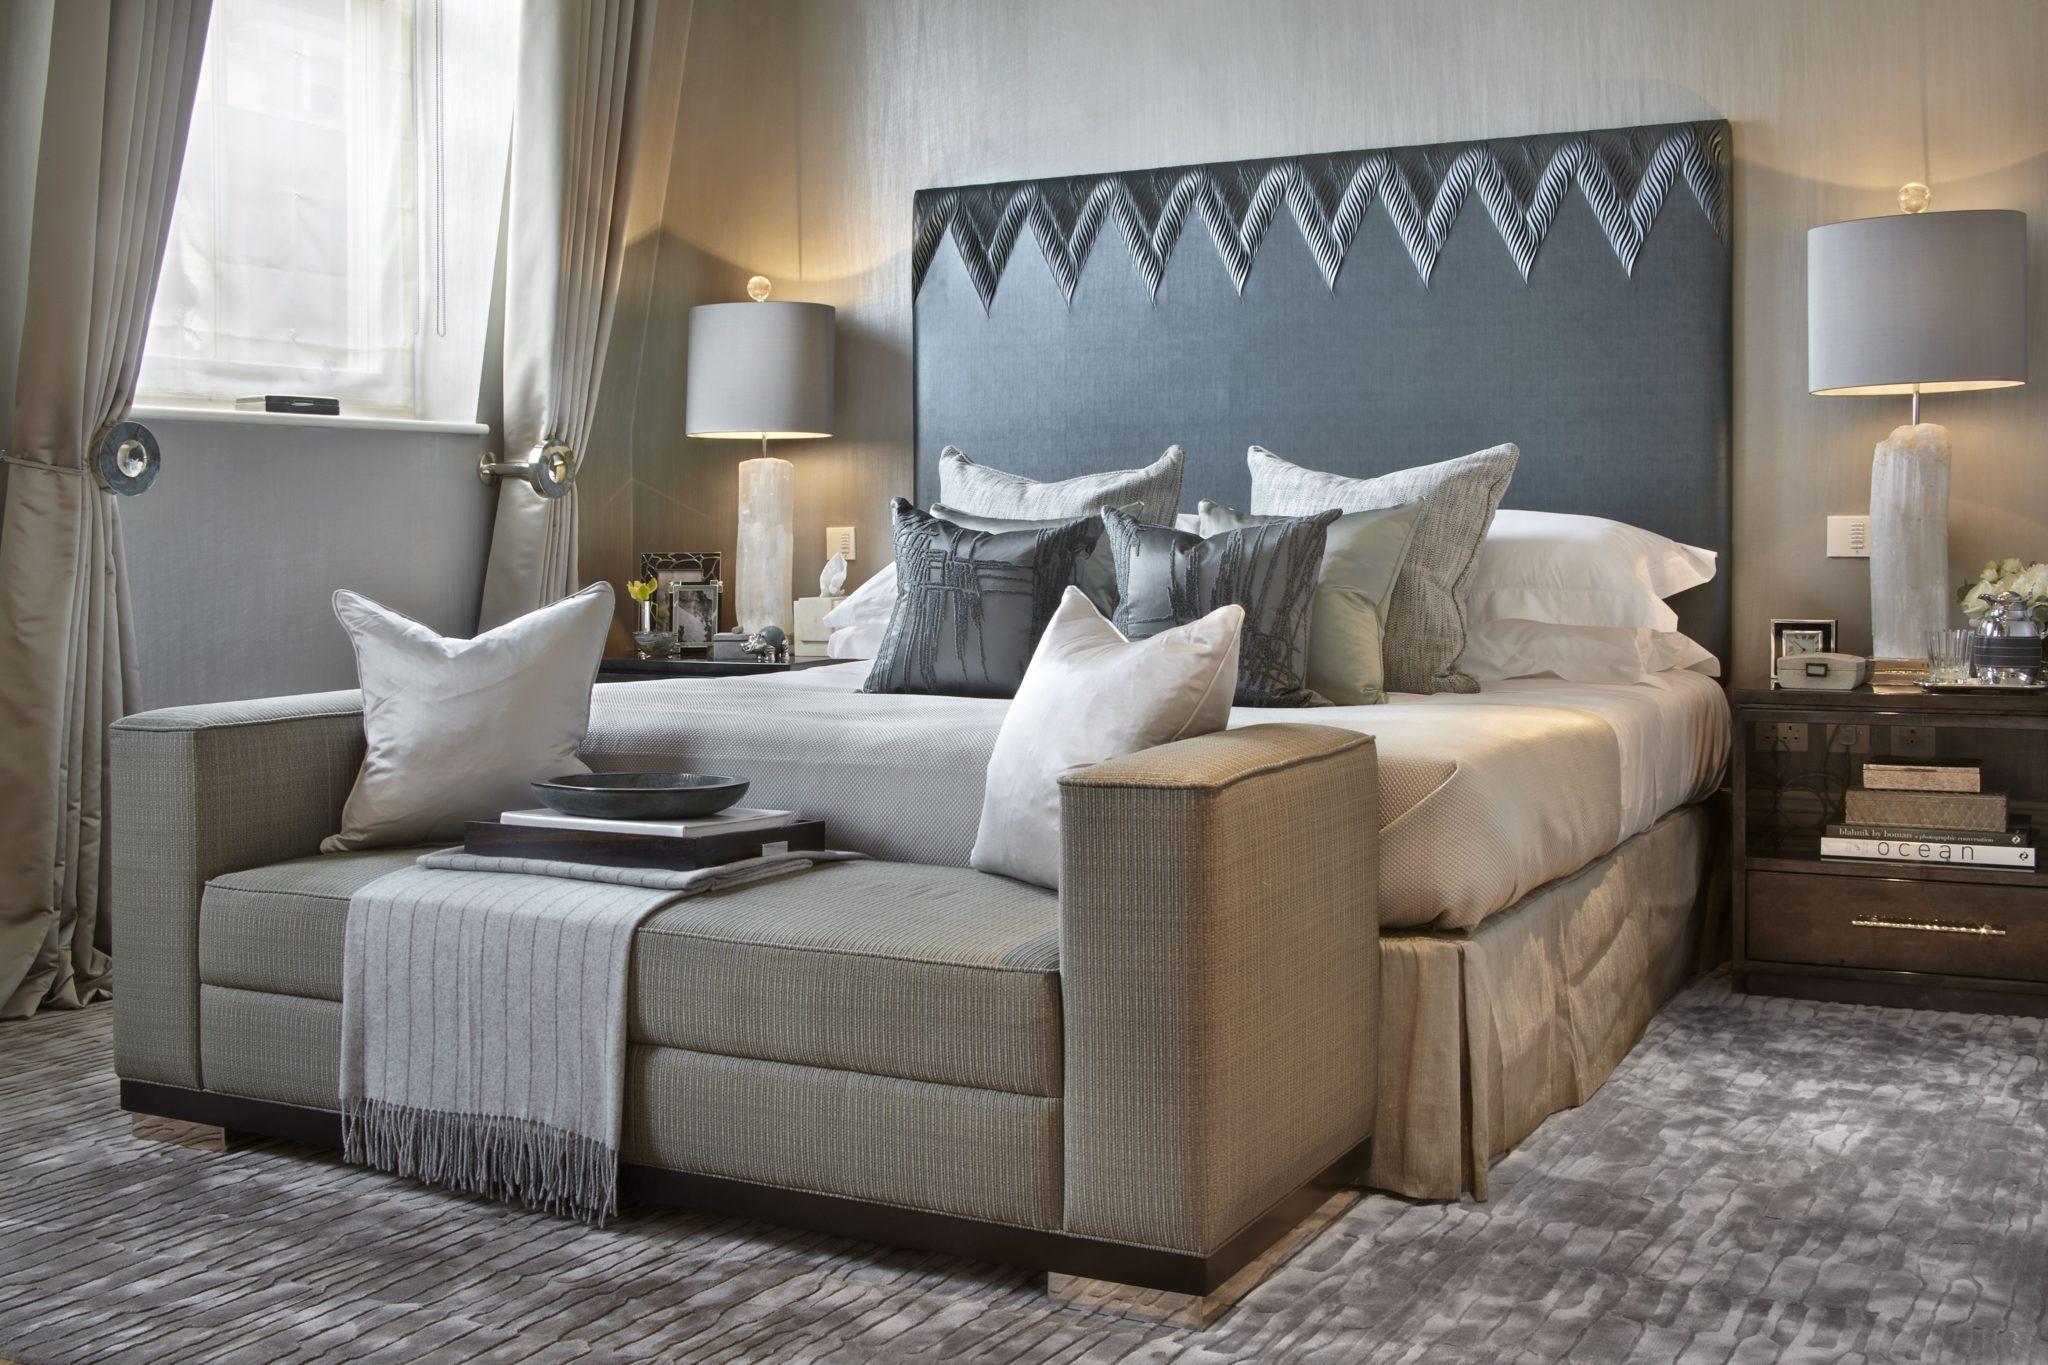 Master bedroom by Katharine Pooley